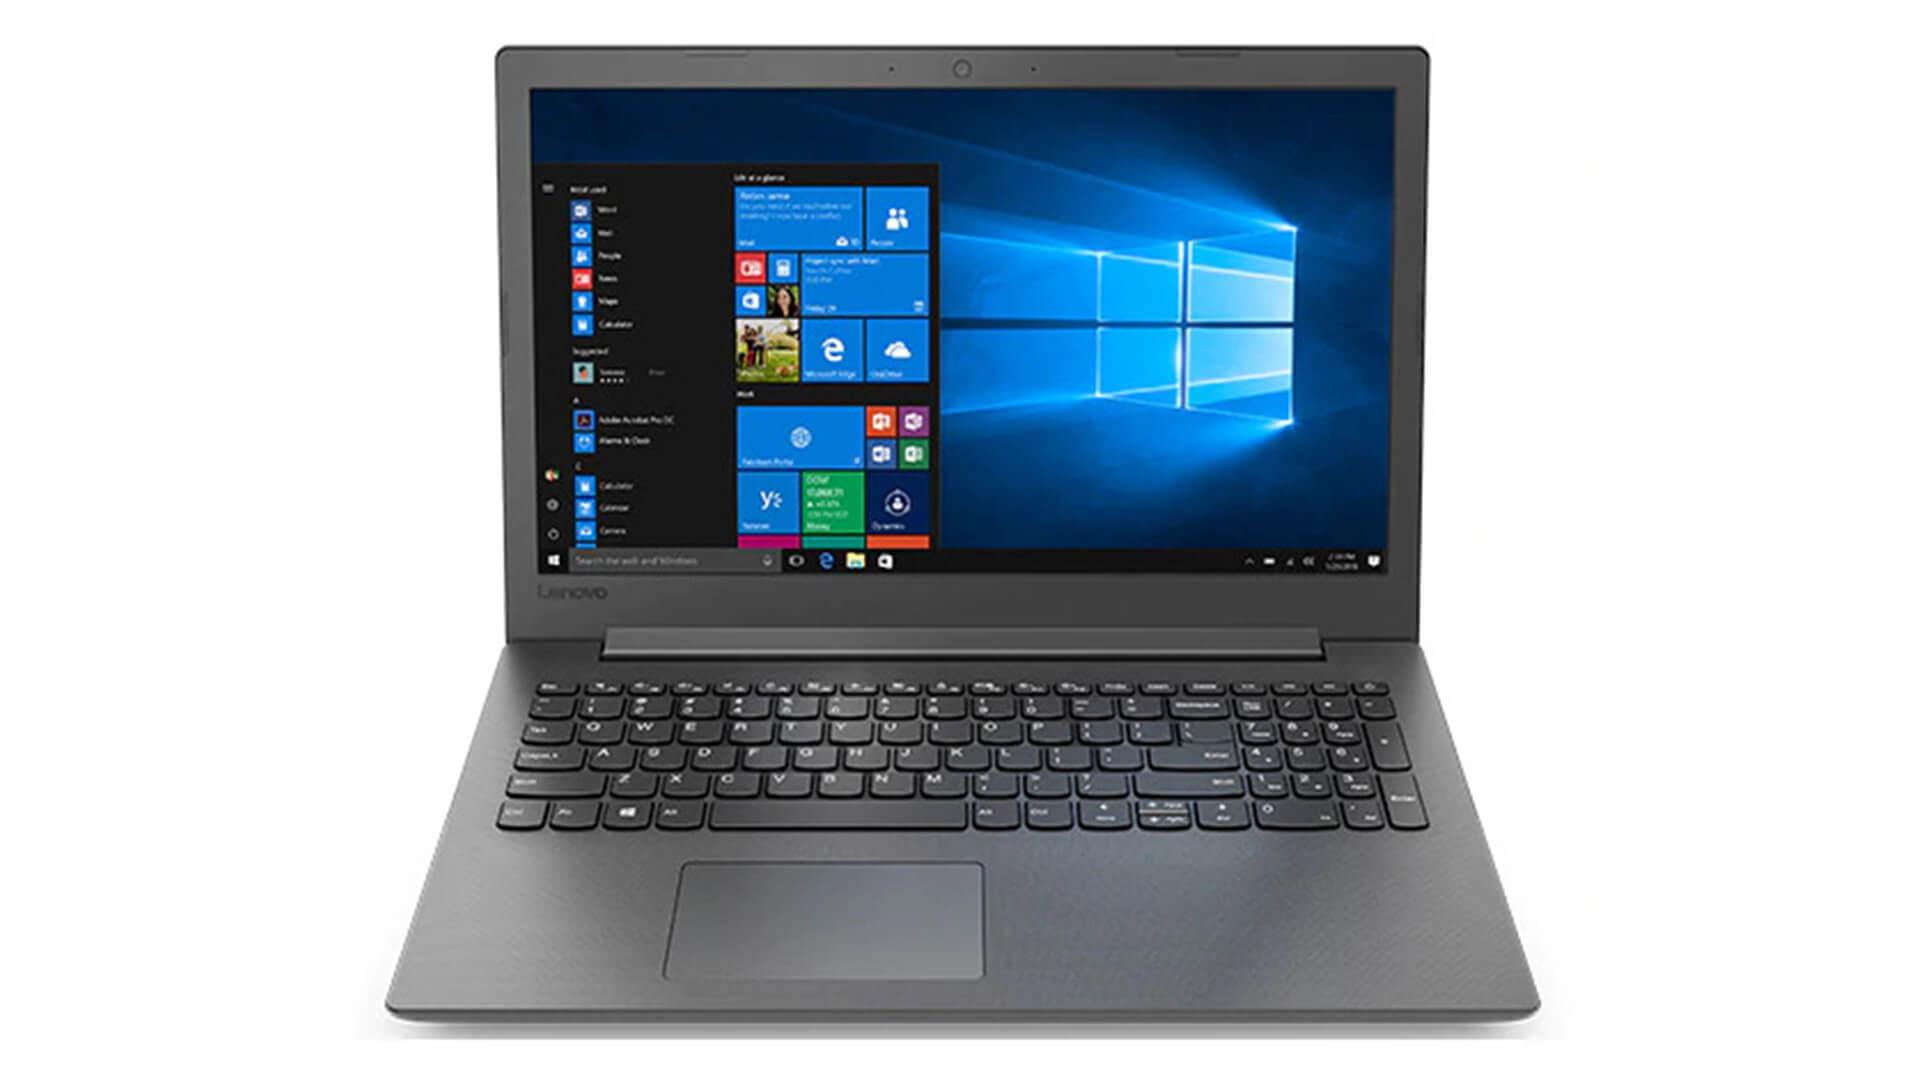 لپ تاپ ۱۱ اینچی لنوو مدل IdeaPad 1 – A